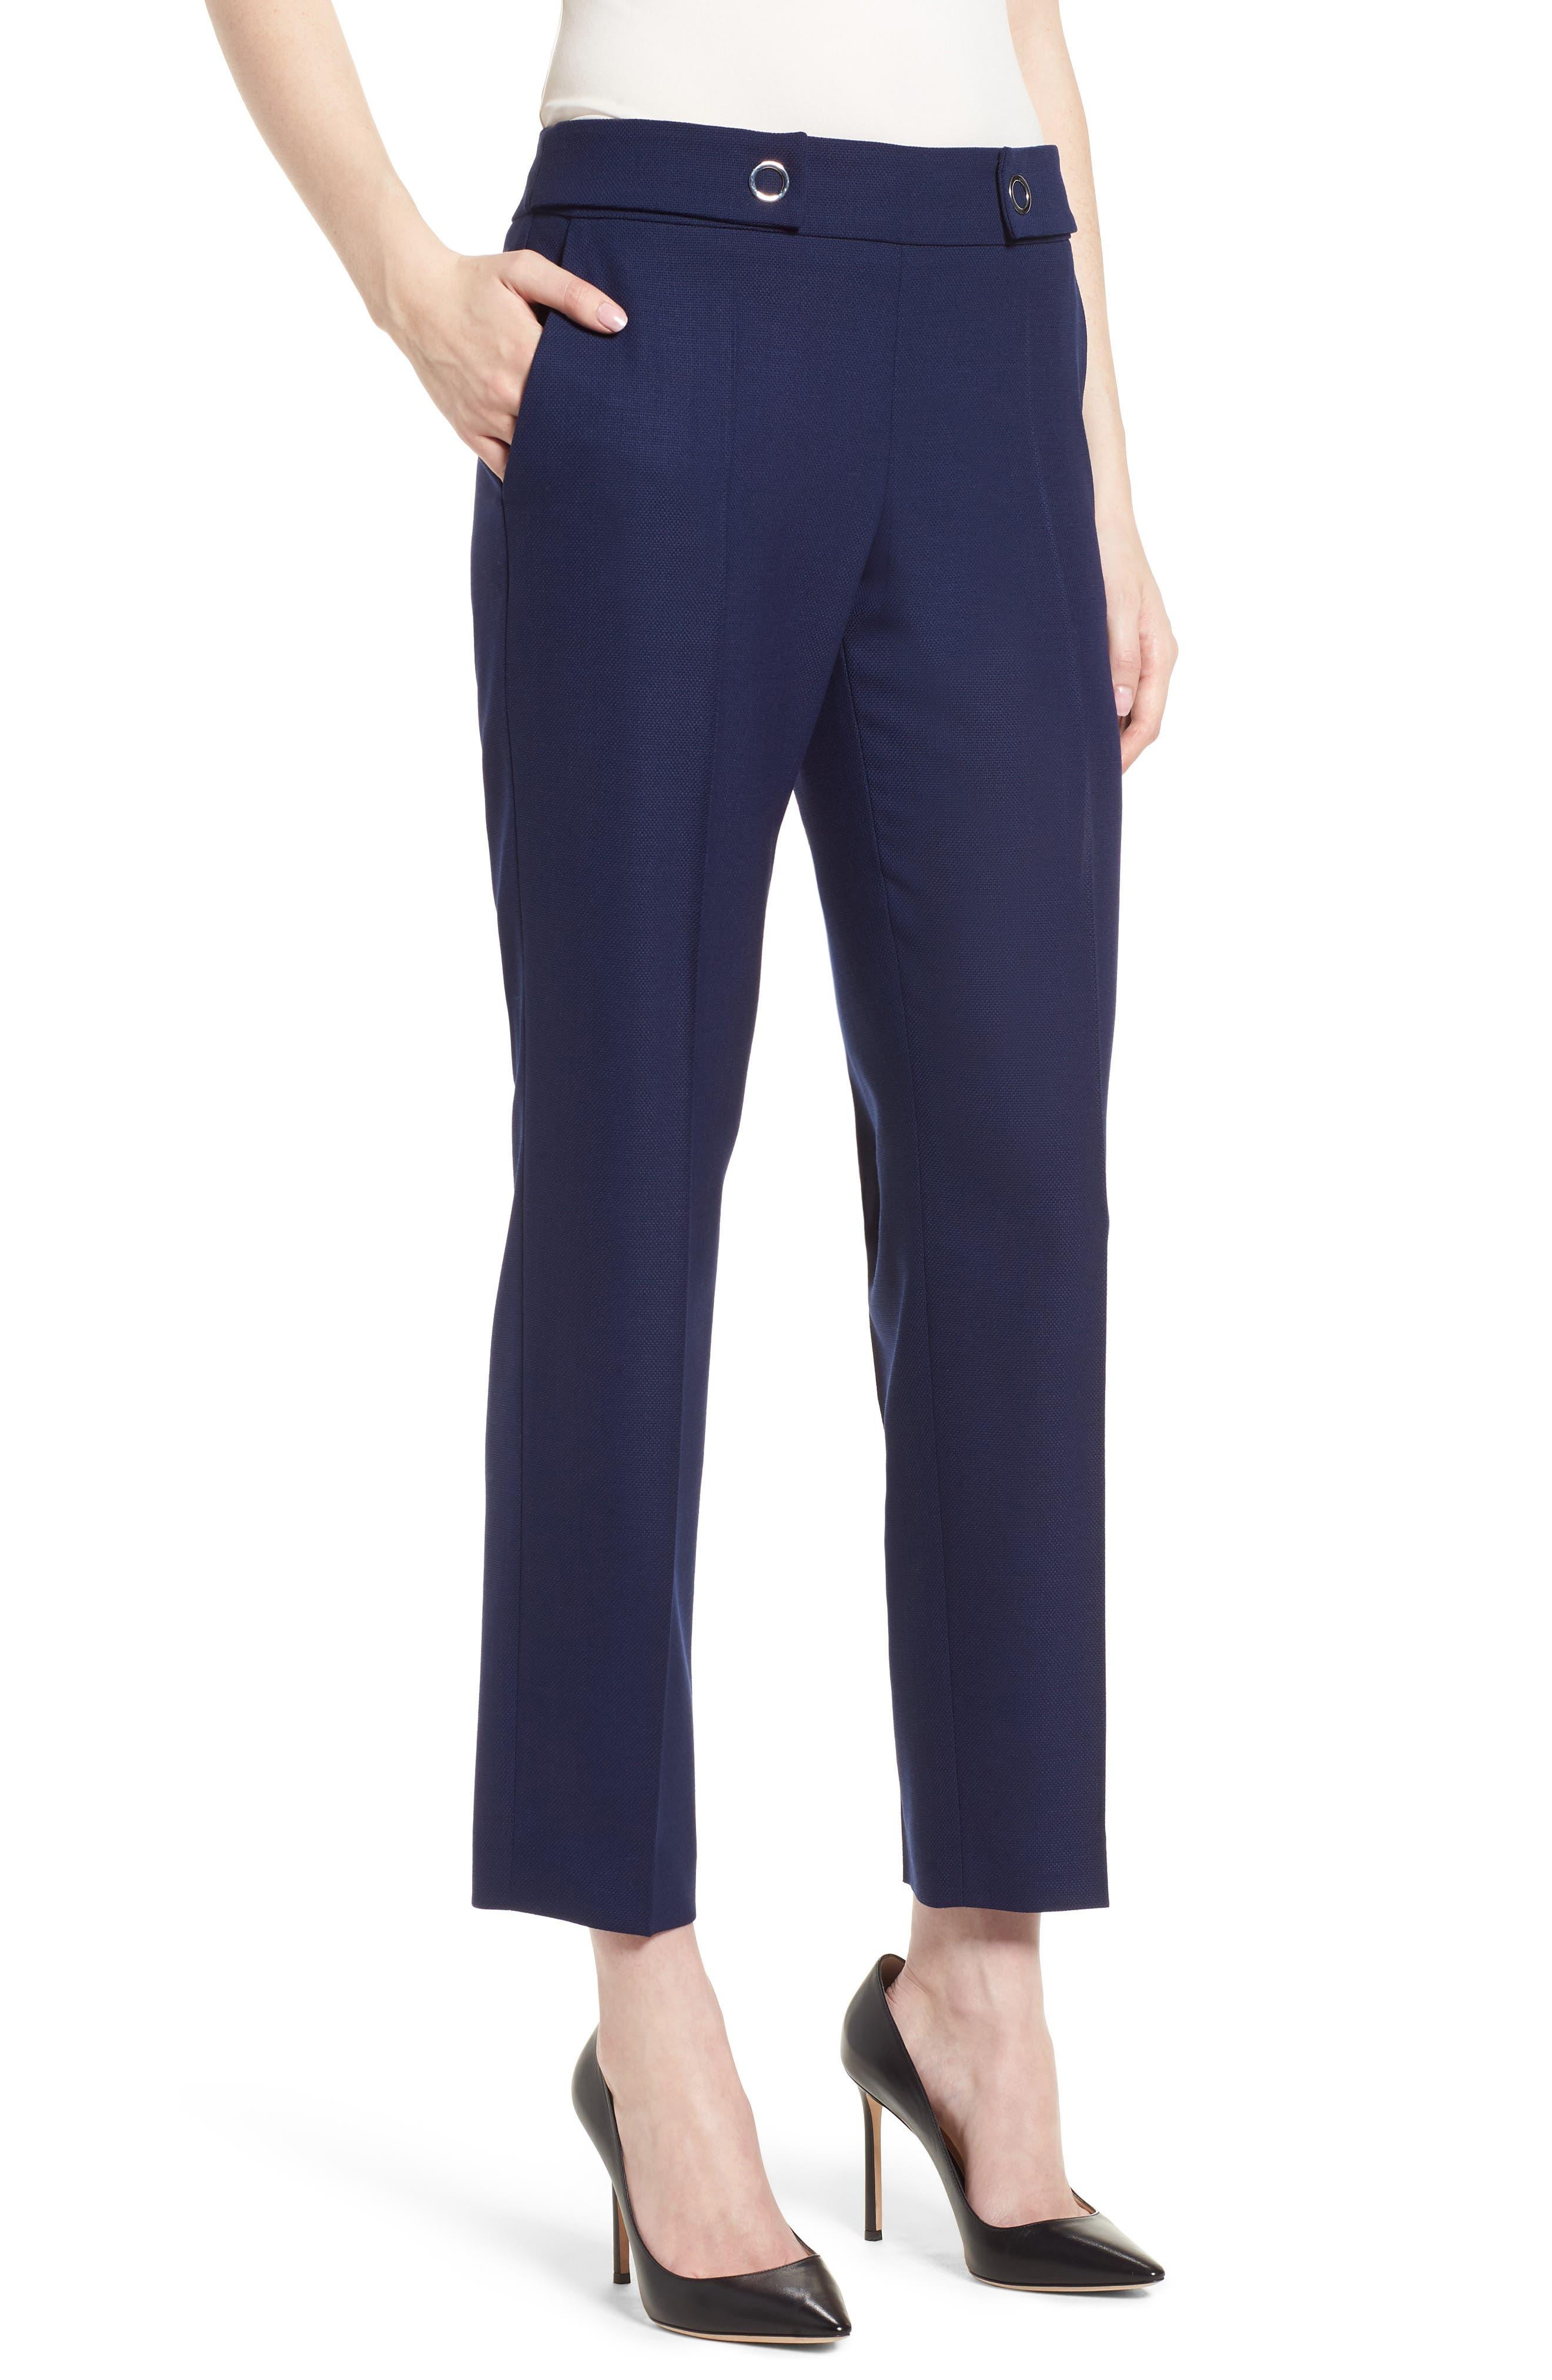 Tibalena Textured Stretch Wool Suit Pants,                             Main thumbnail 1, color,                             425